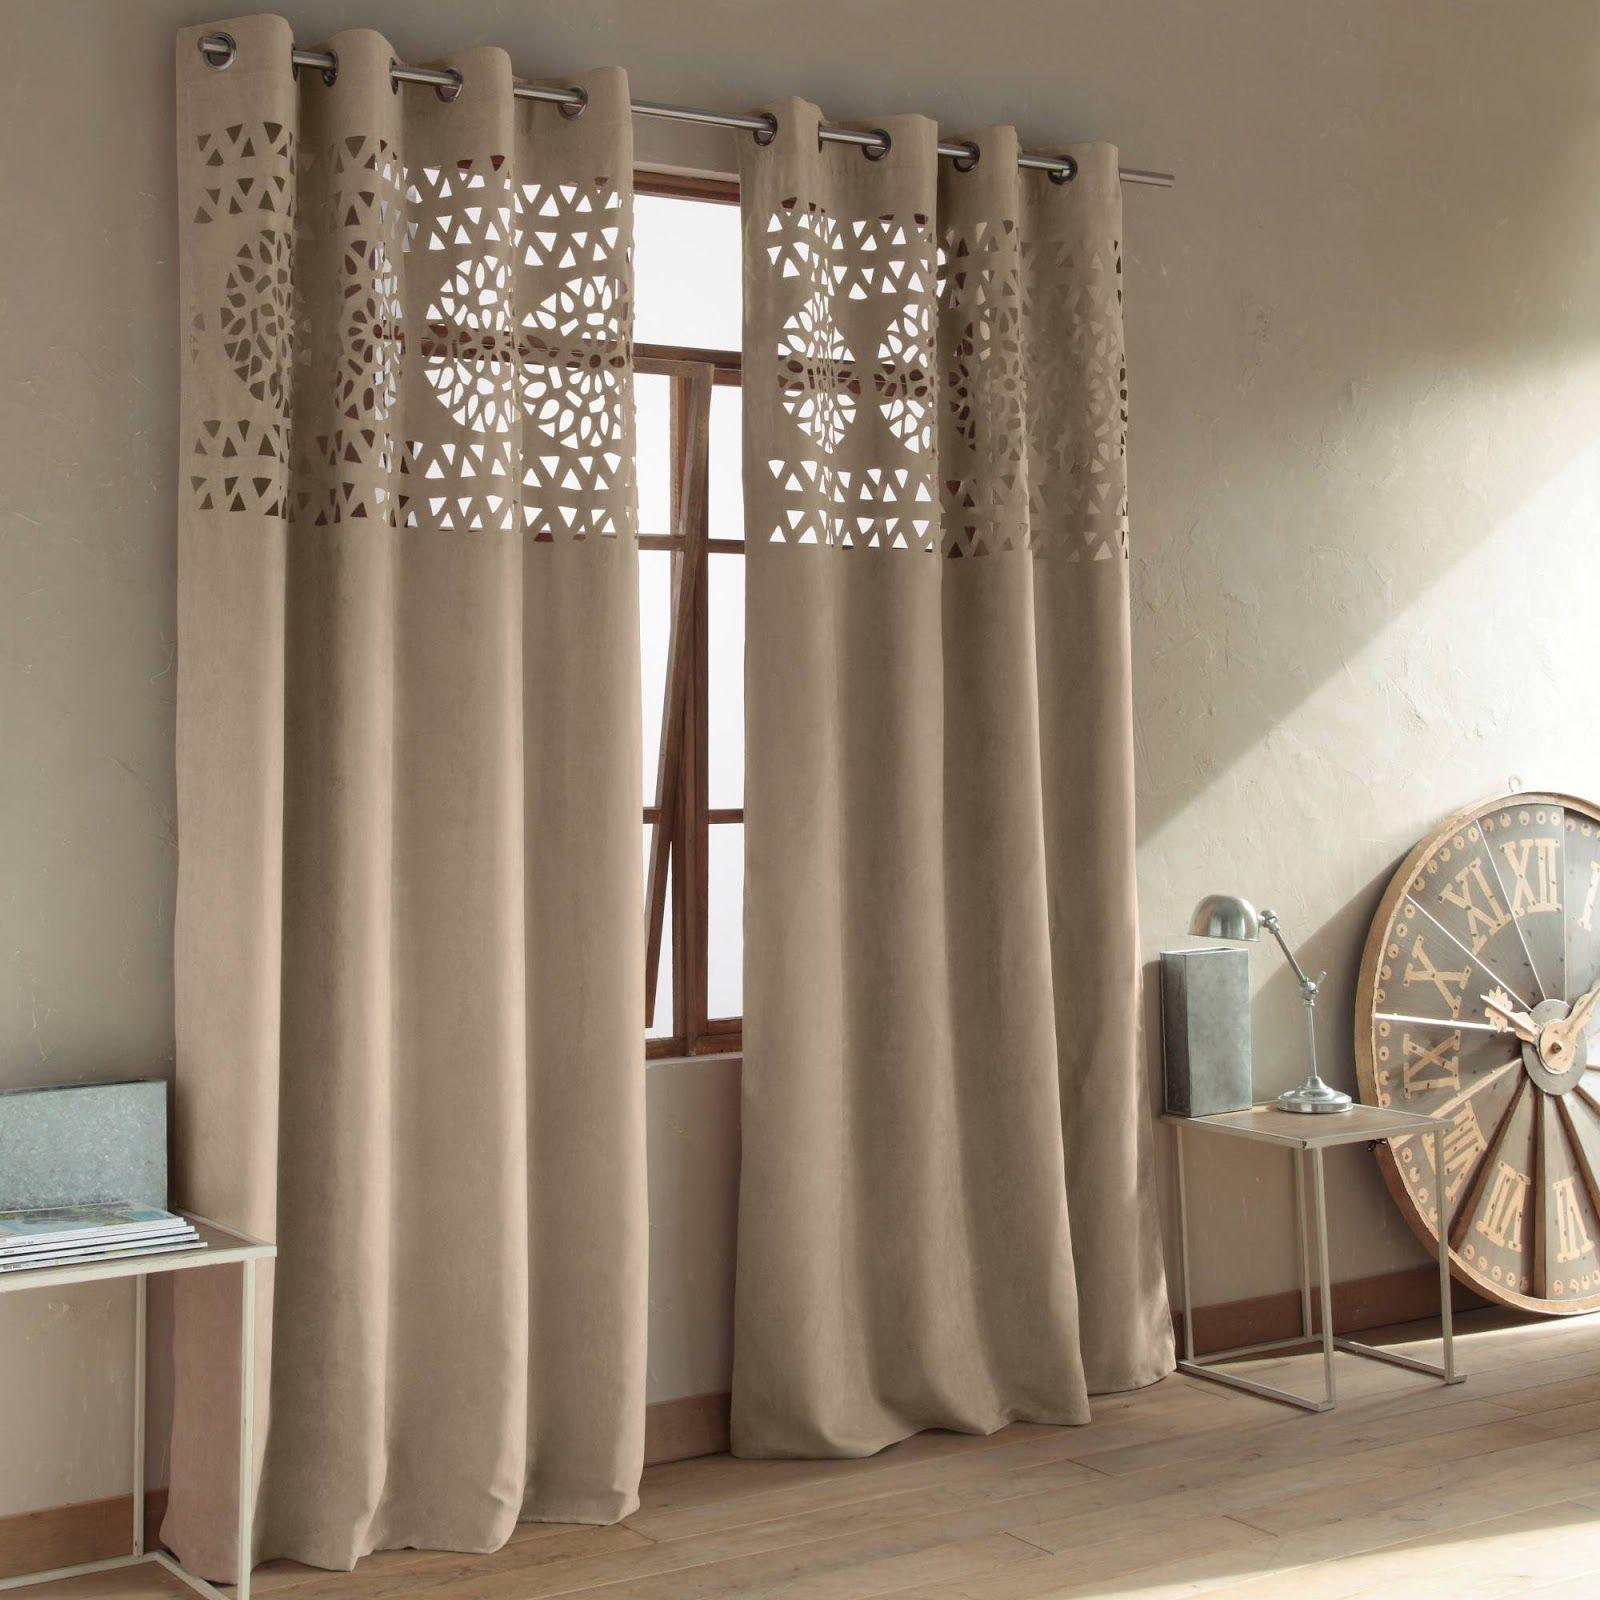 Sedar rideaux tunisie sedar swarovski - Rideaux pour cuisine design ...